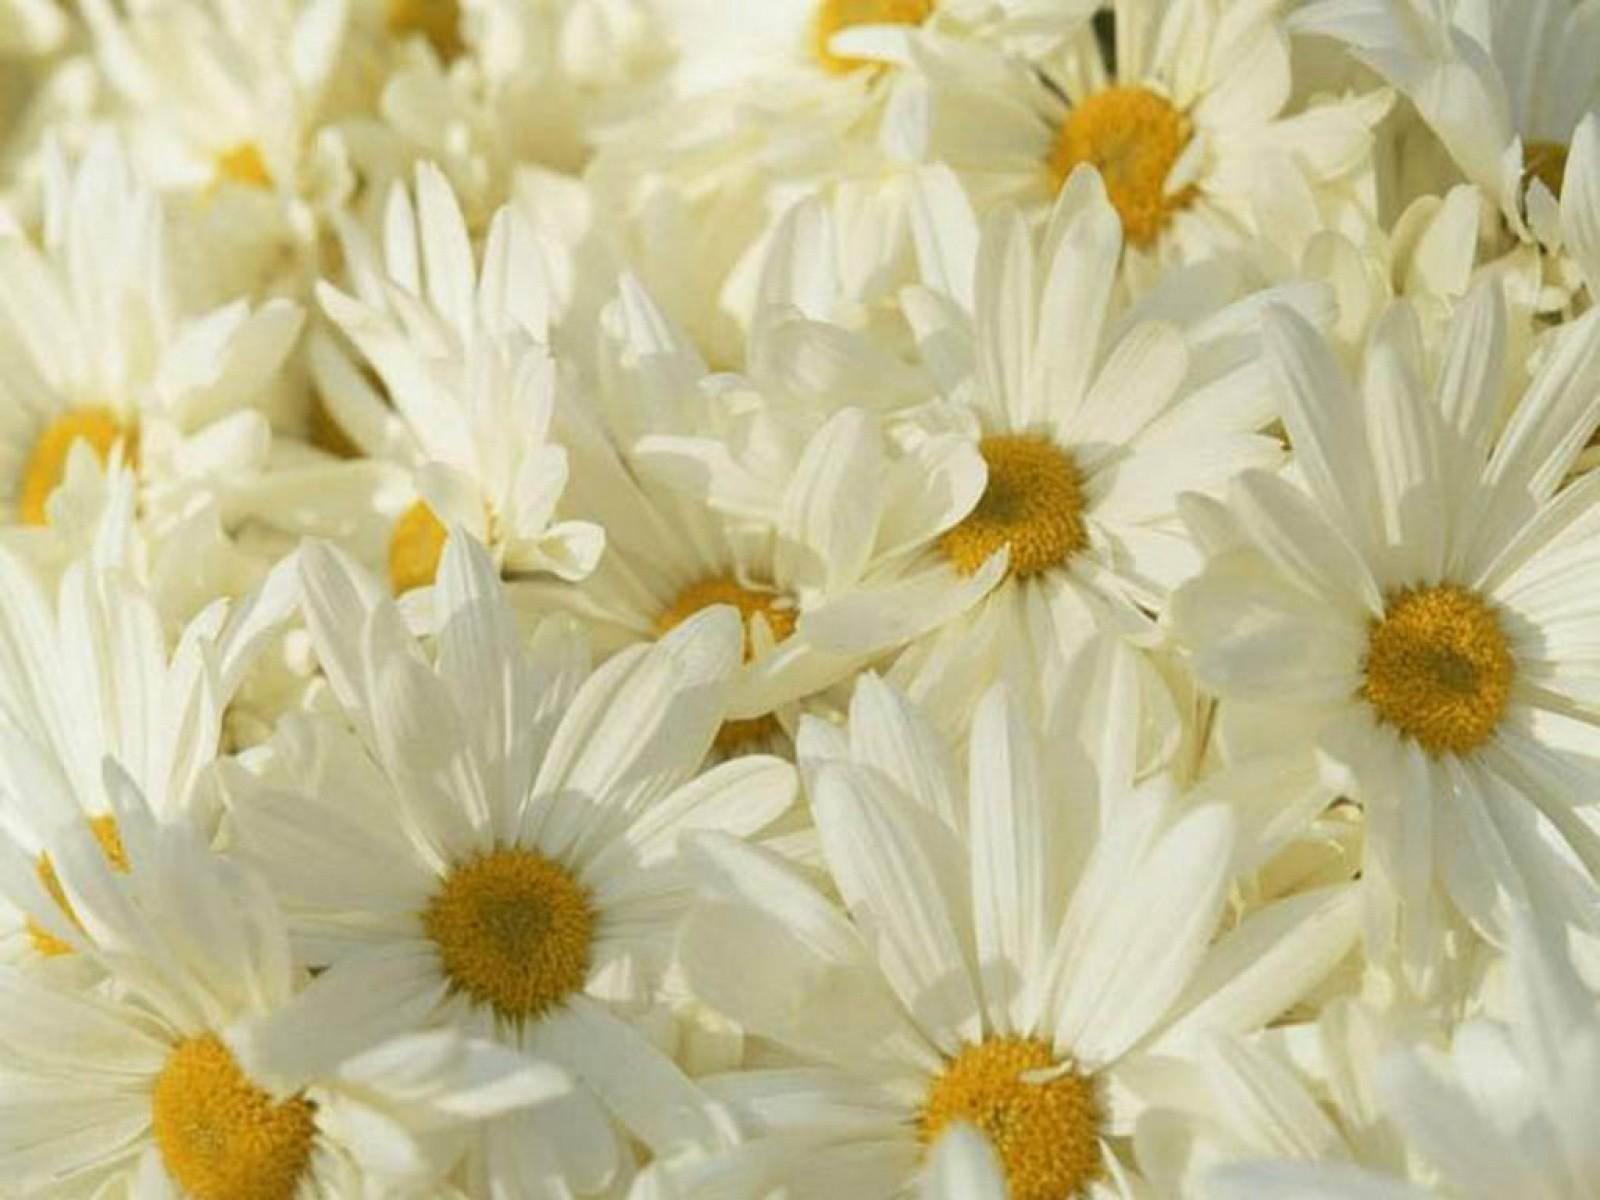 Flowers daisy white flowers wallpaper 1600x1200 190404 wallpaperup izmirmasajfo